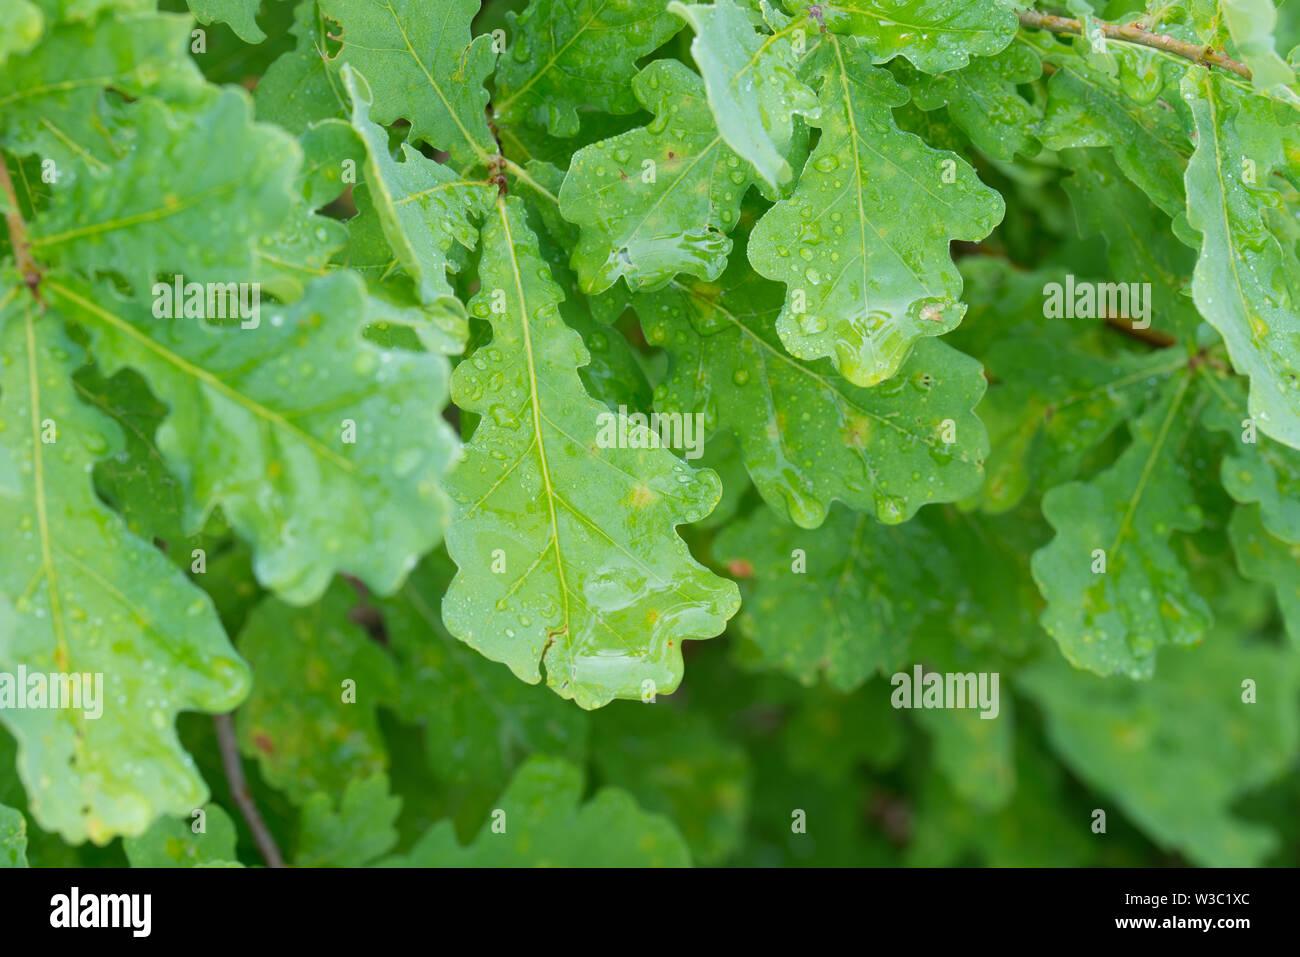 water drops on summer oak green leaves closeup - Stock Image